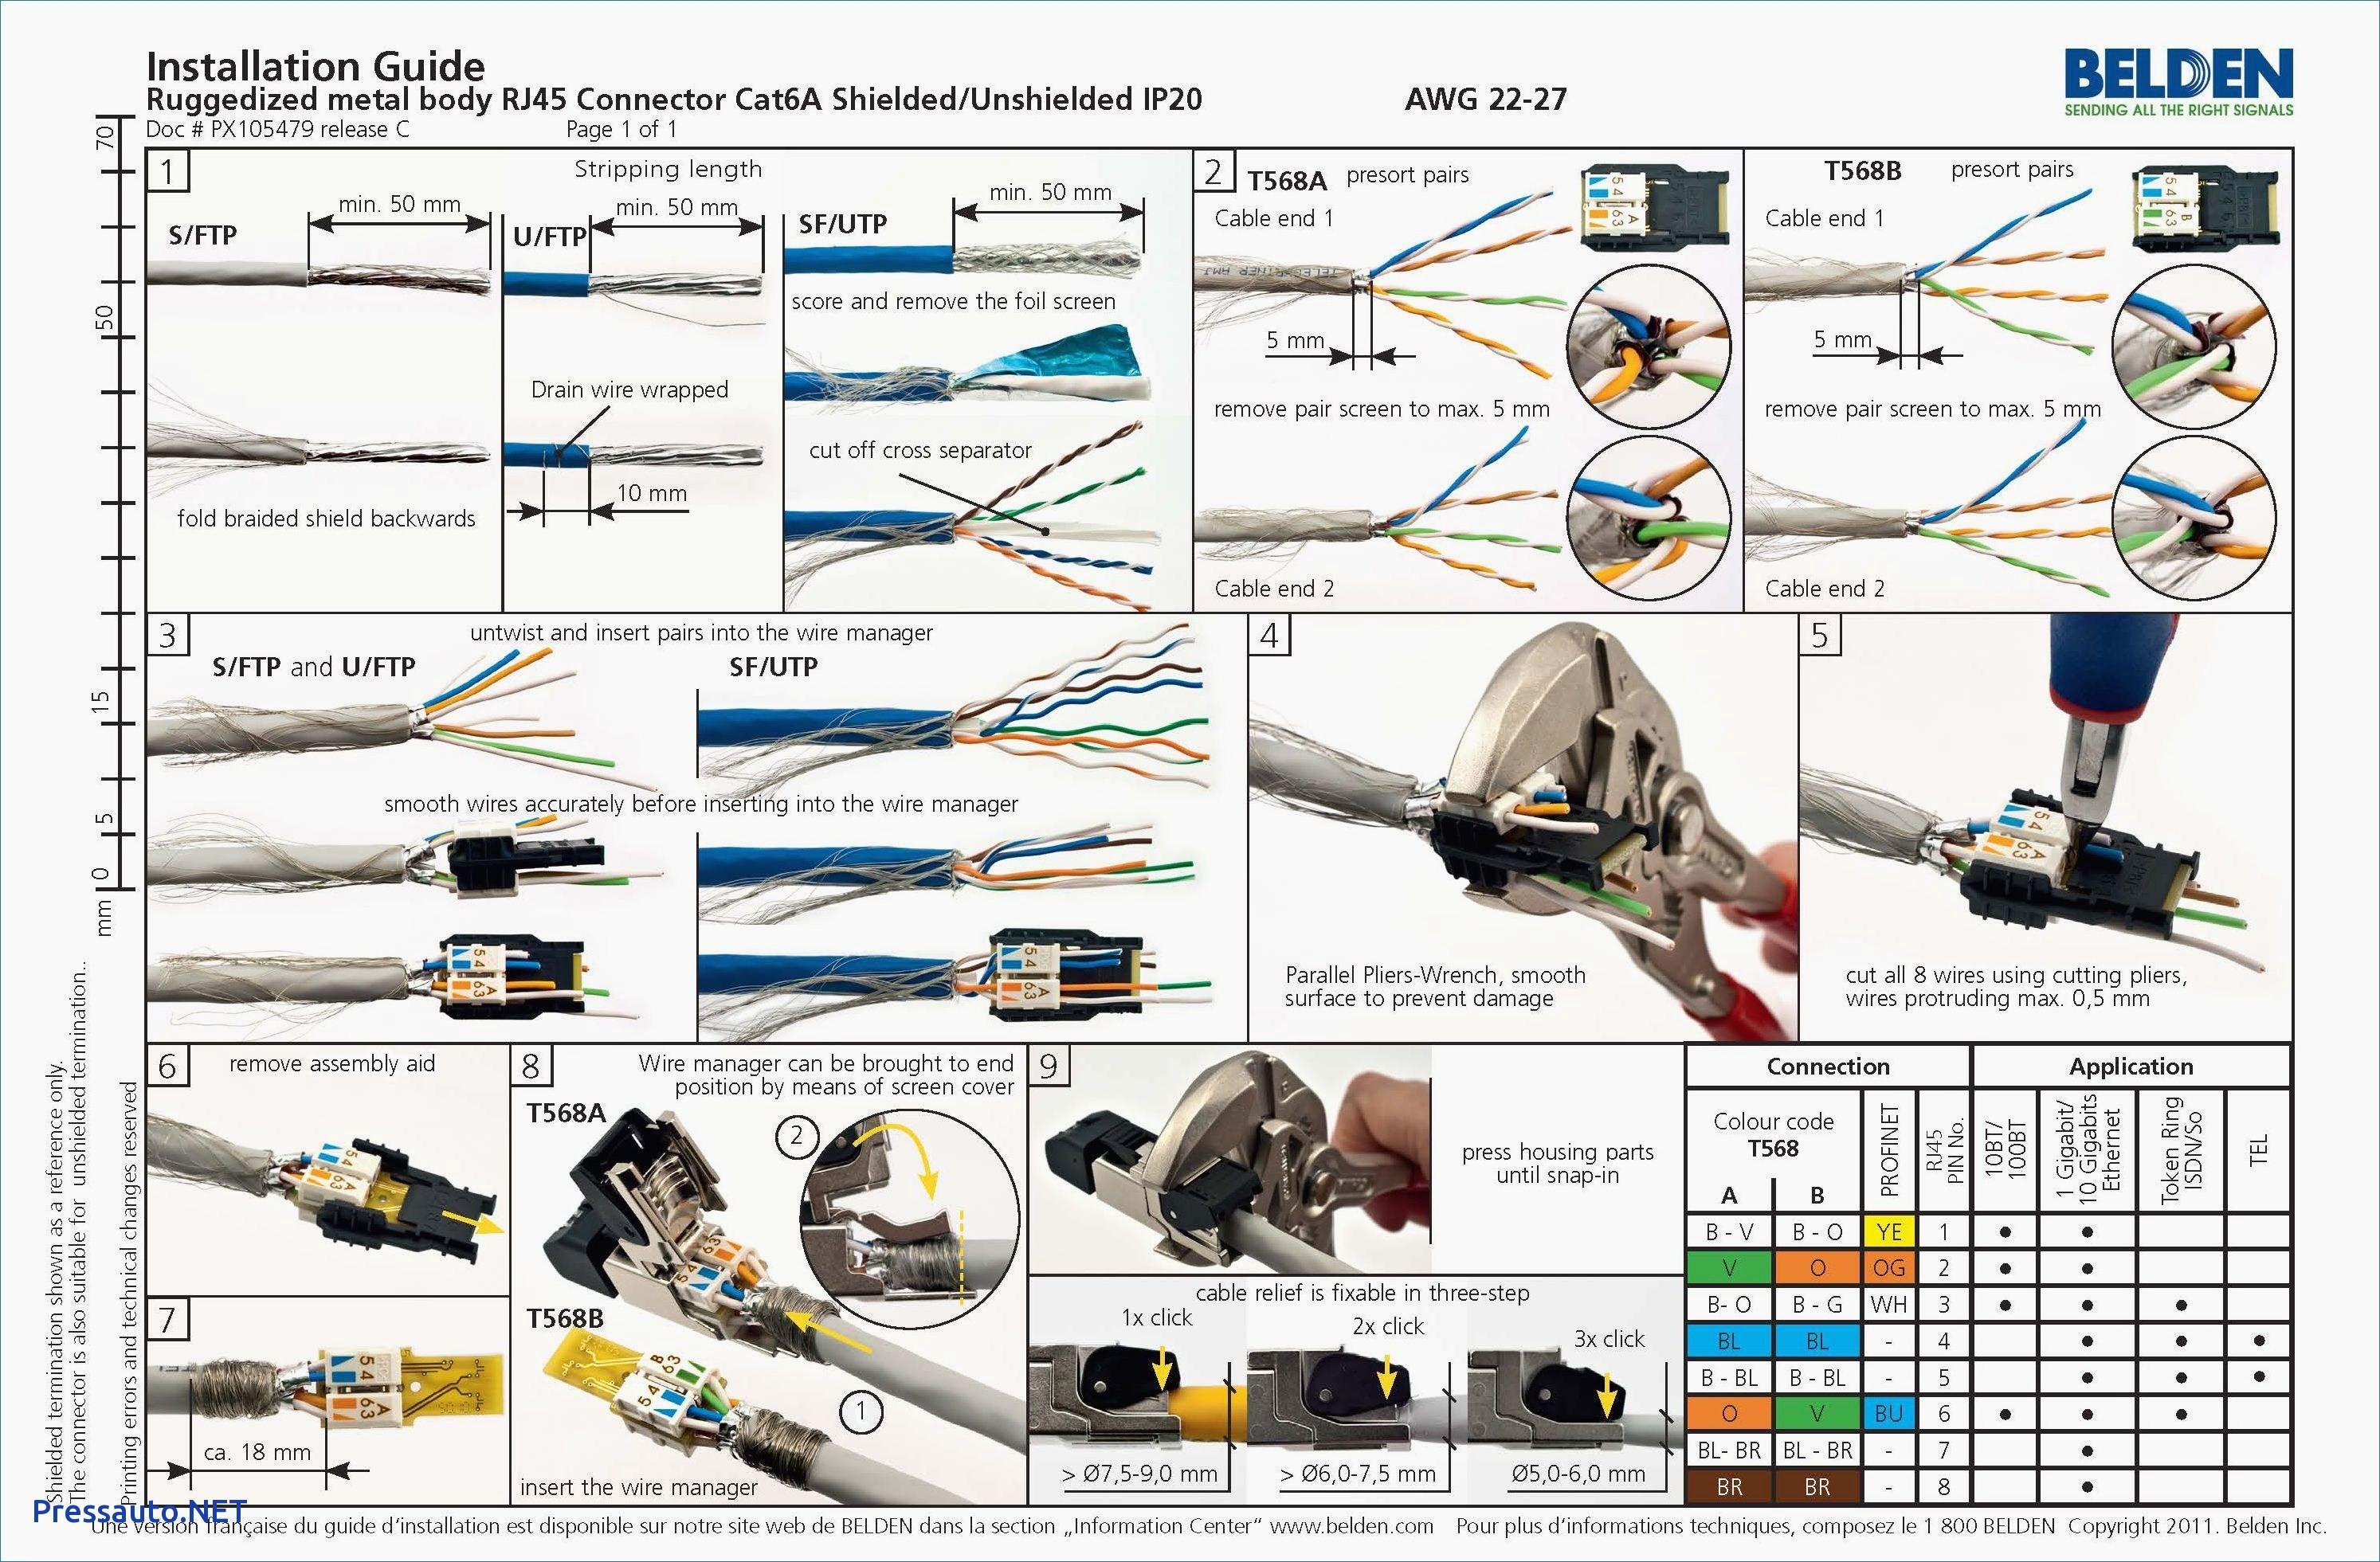 Wiring Diagram for Ethernet Cable Inspirationa Elegant Cat 6 Wiring Diagram Rj45 Diagram